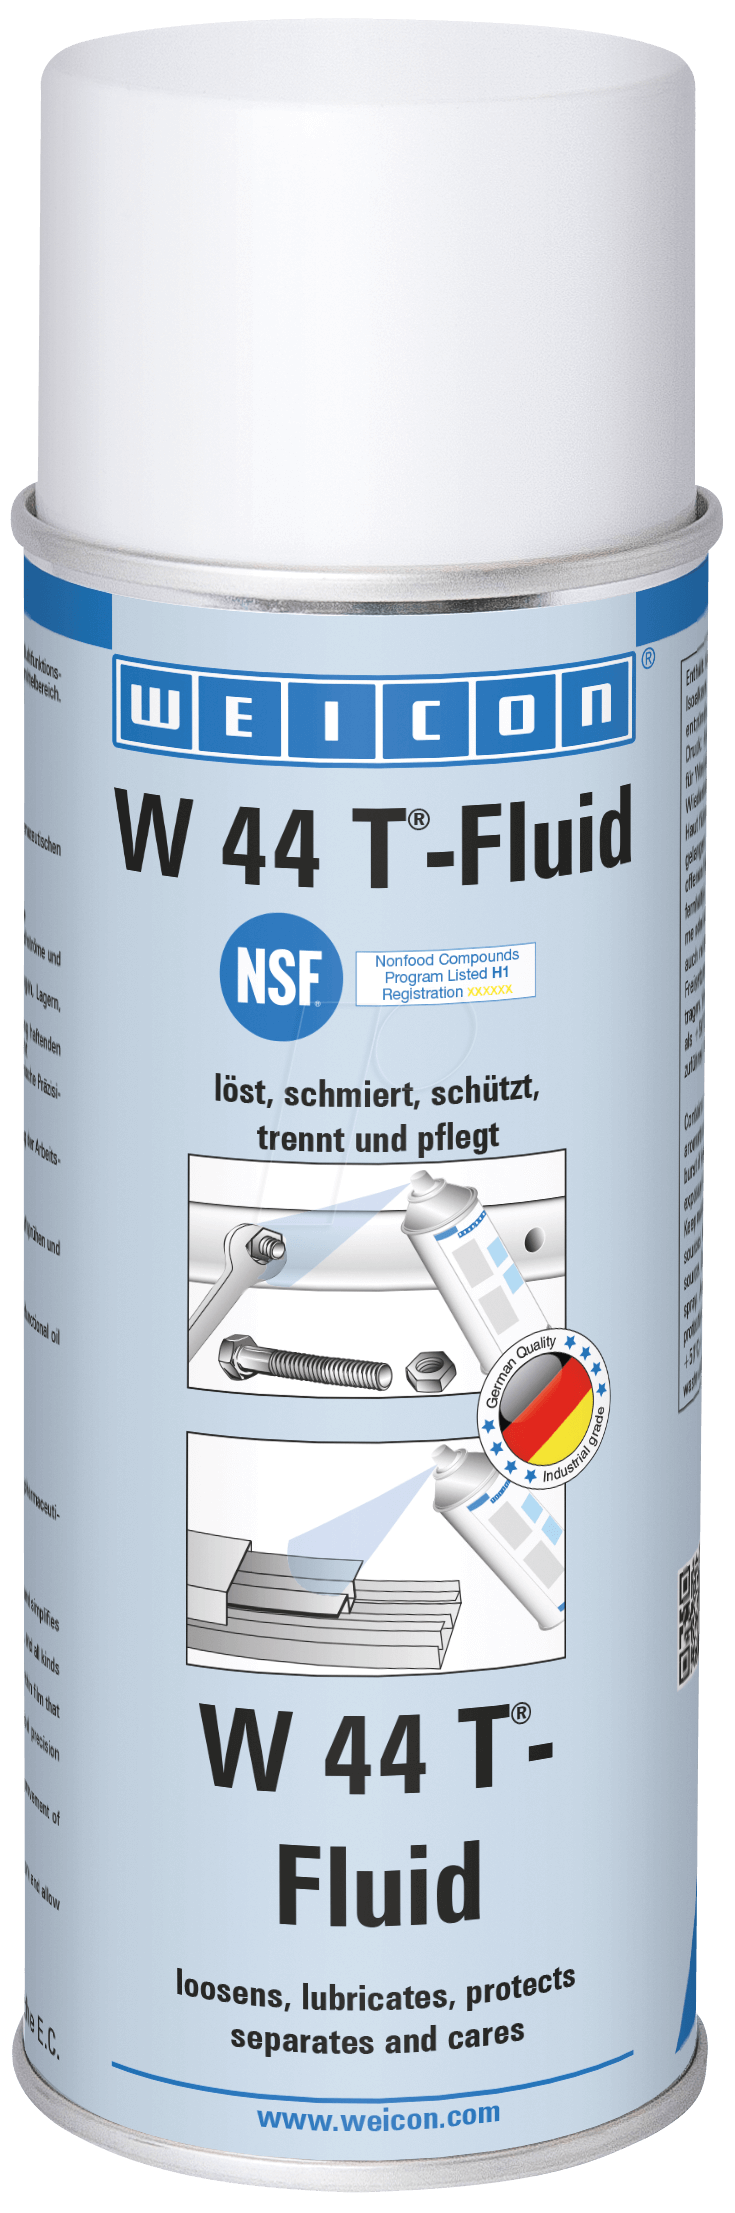 WEICON 11253400 - Universalöl, W 44 T Fluid, 40...